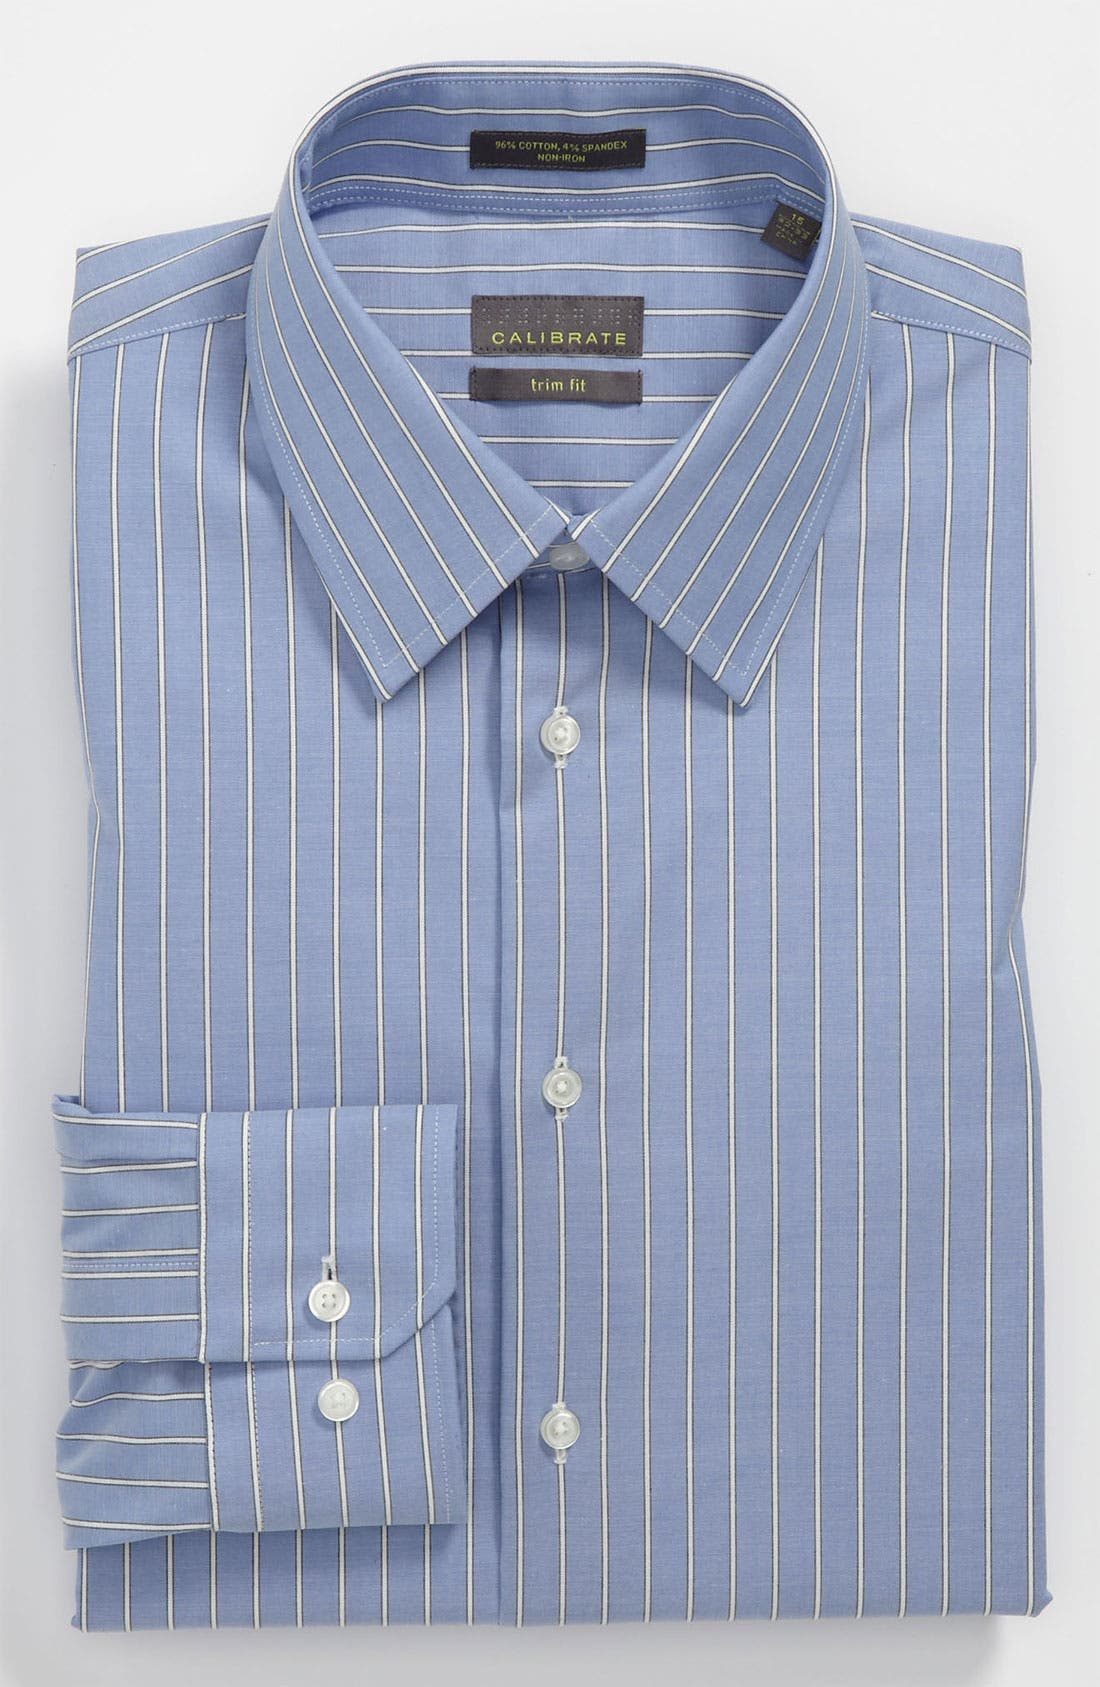 Alternate Image 1 Selected - Calibrate Trim Fit Non-Iron Dress Shirt